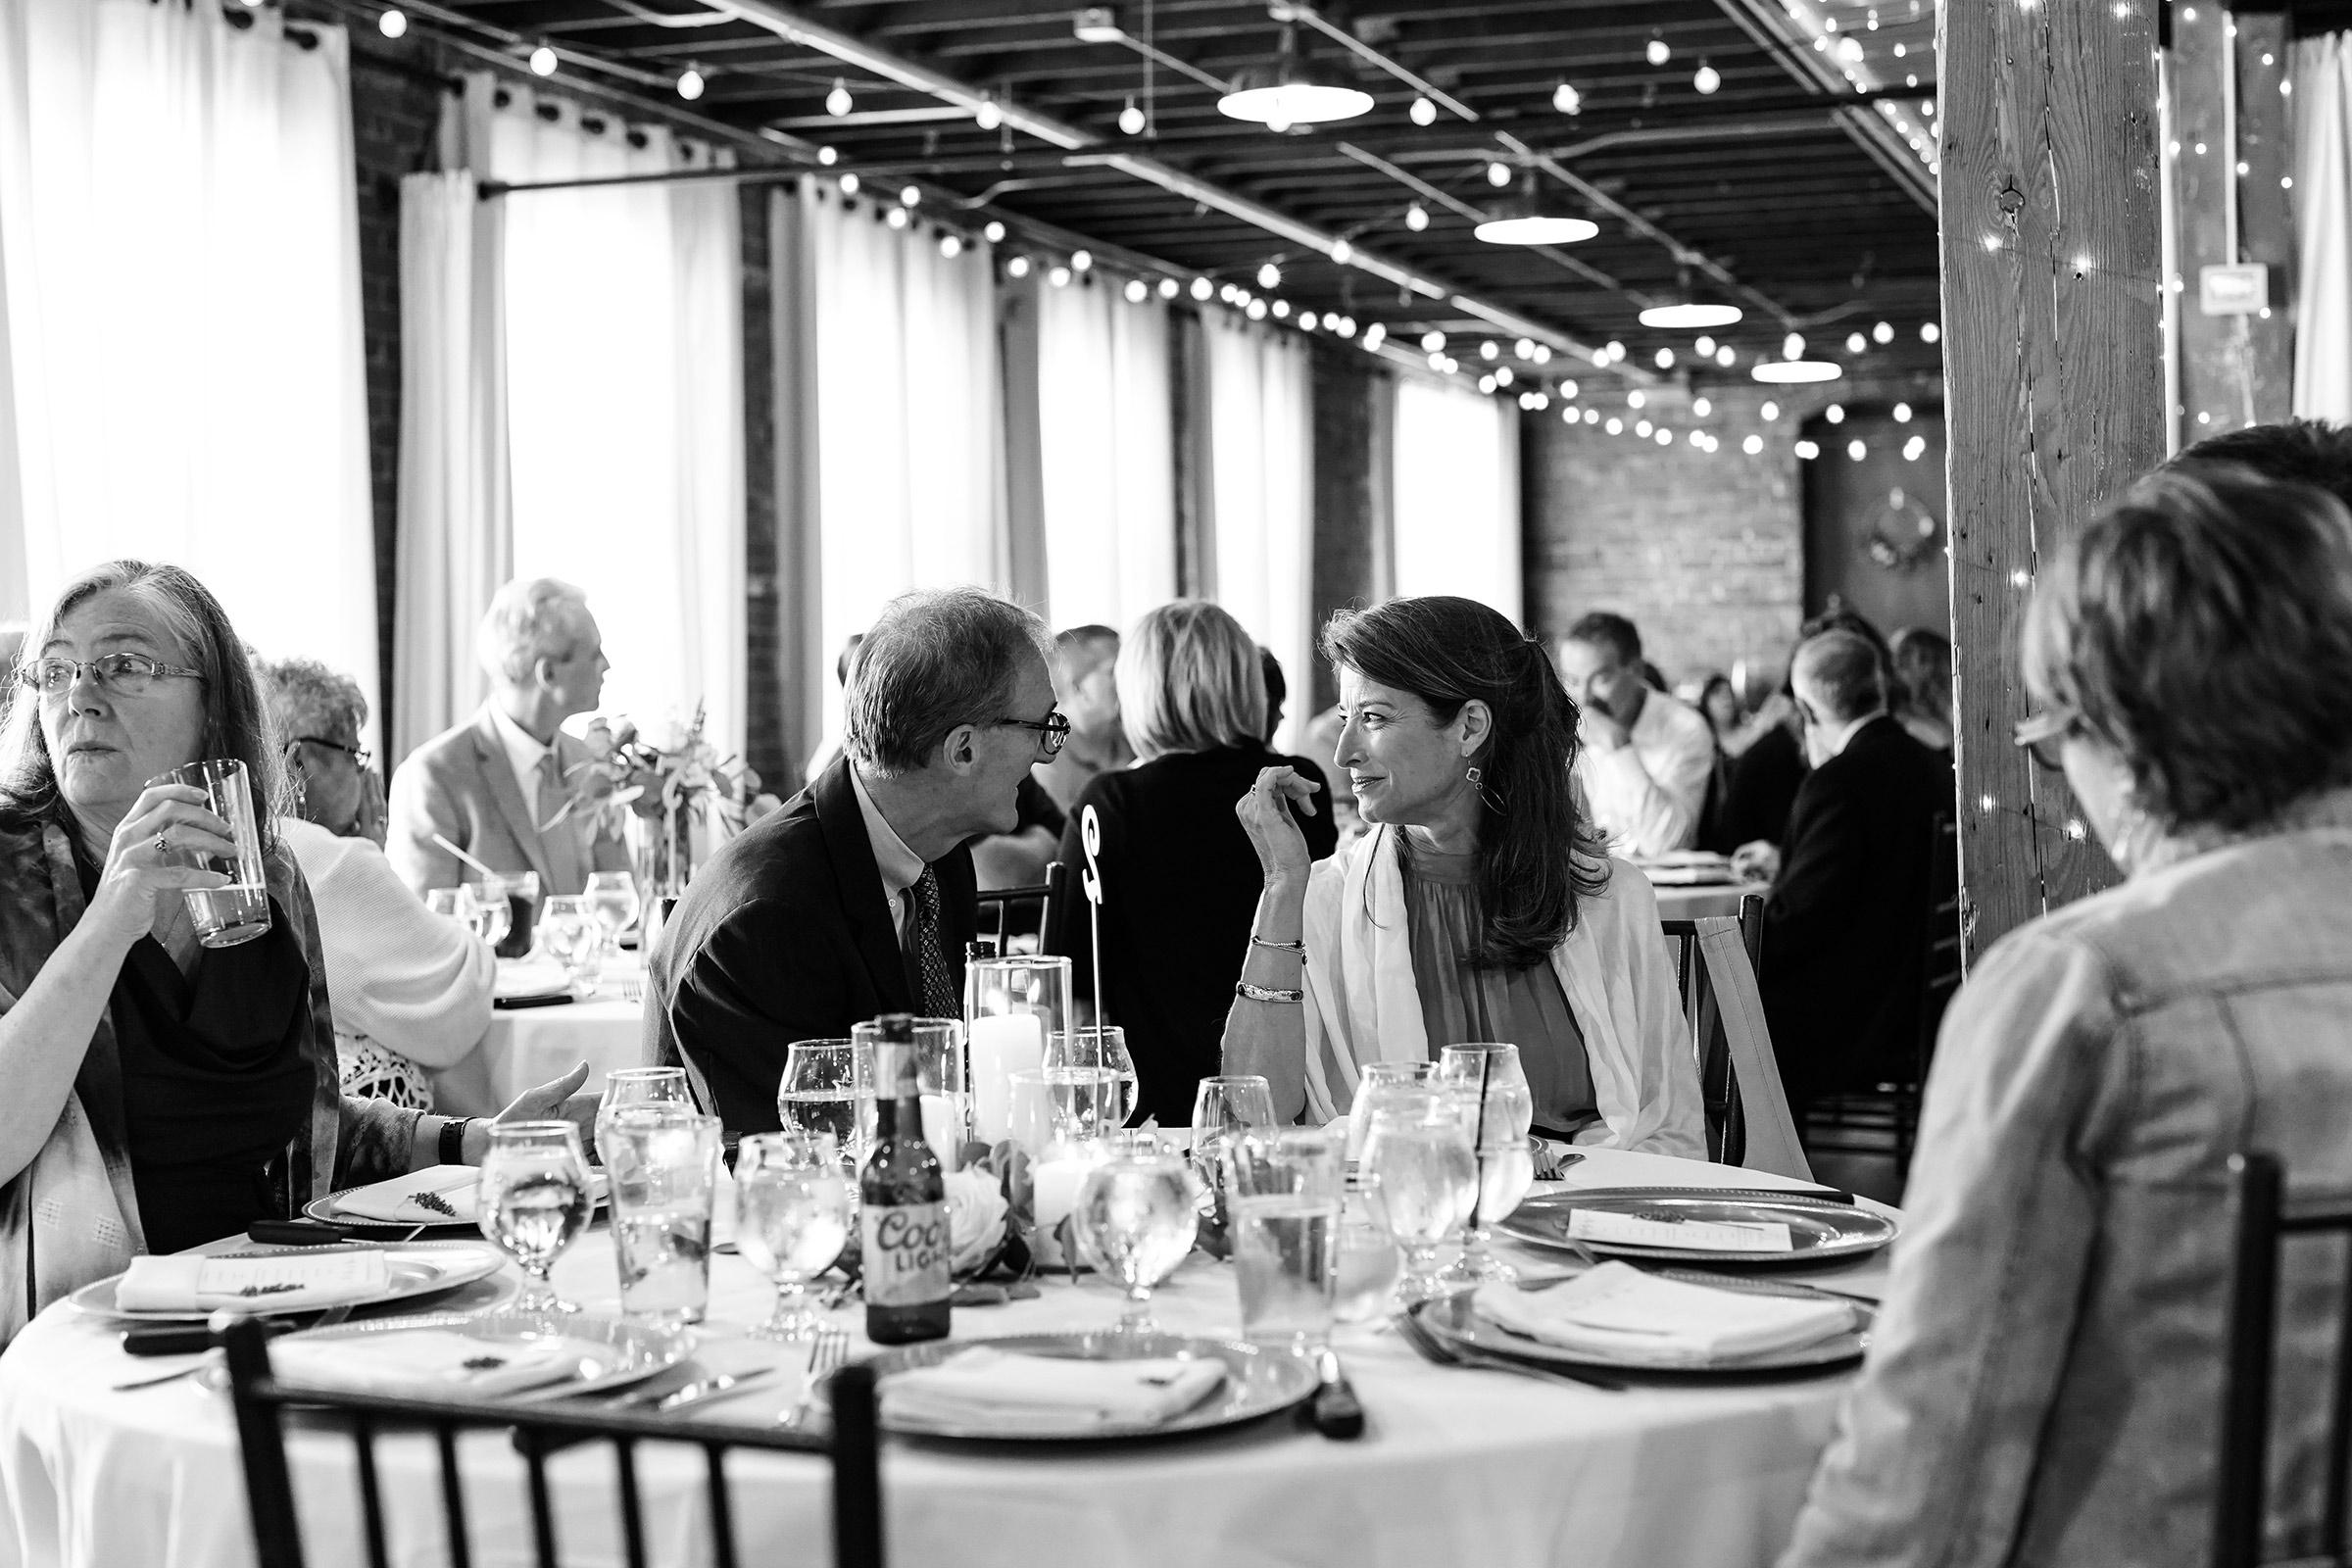 mr-mrs-hull-reception-taproom-couple-desmoines-iowa-raelyn-ramey-photography-558.jpg